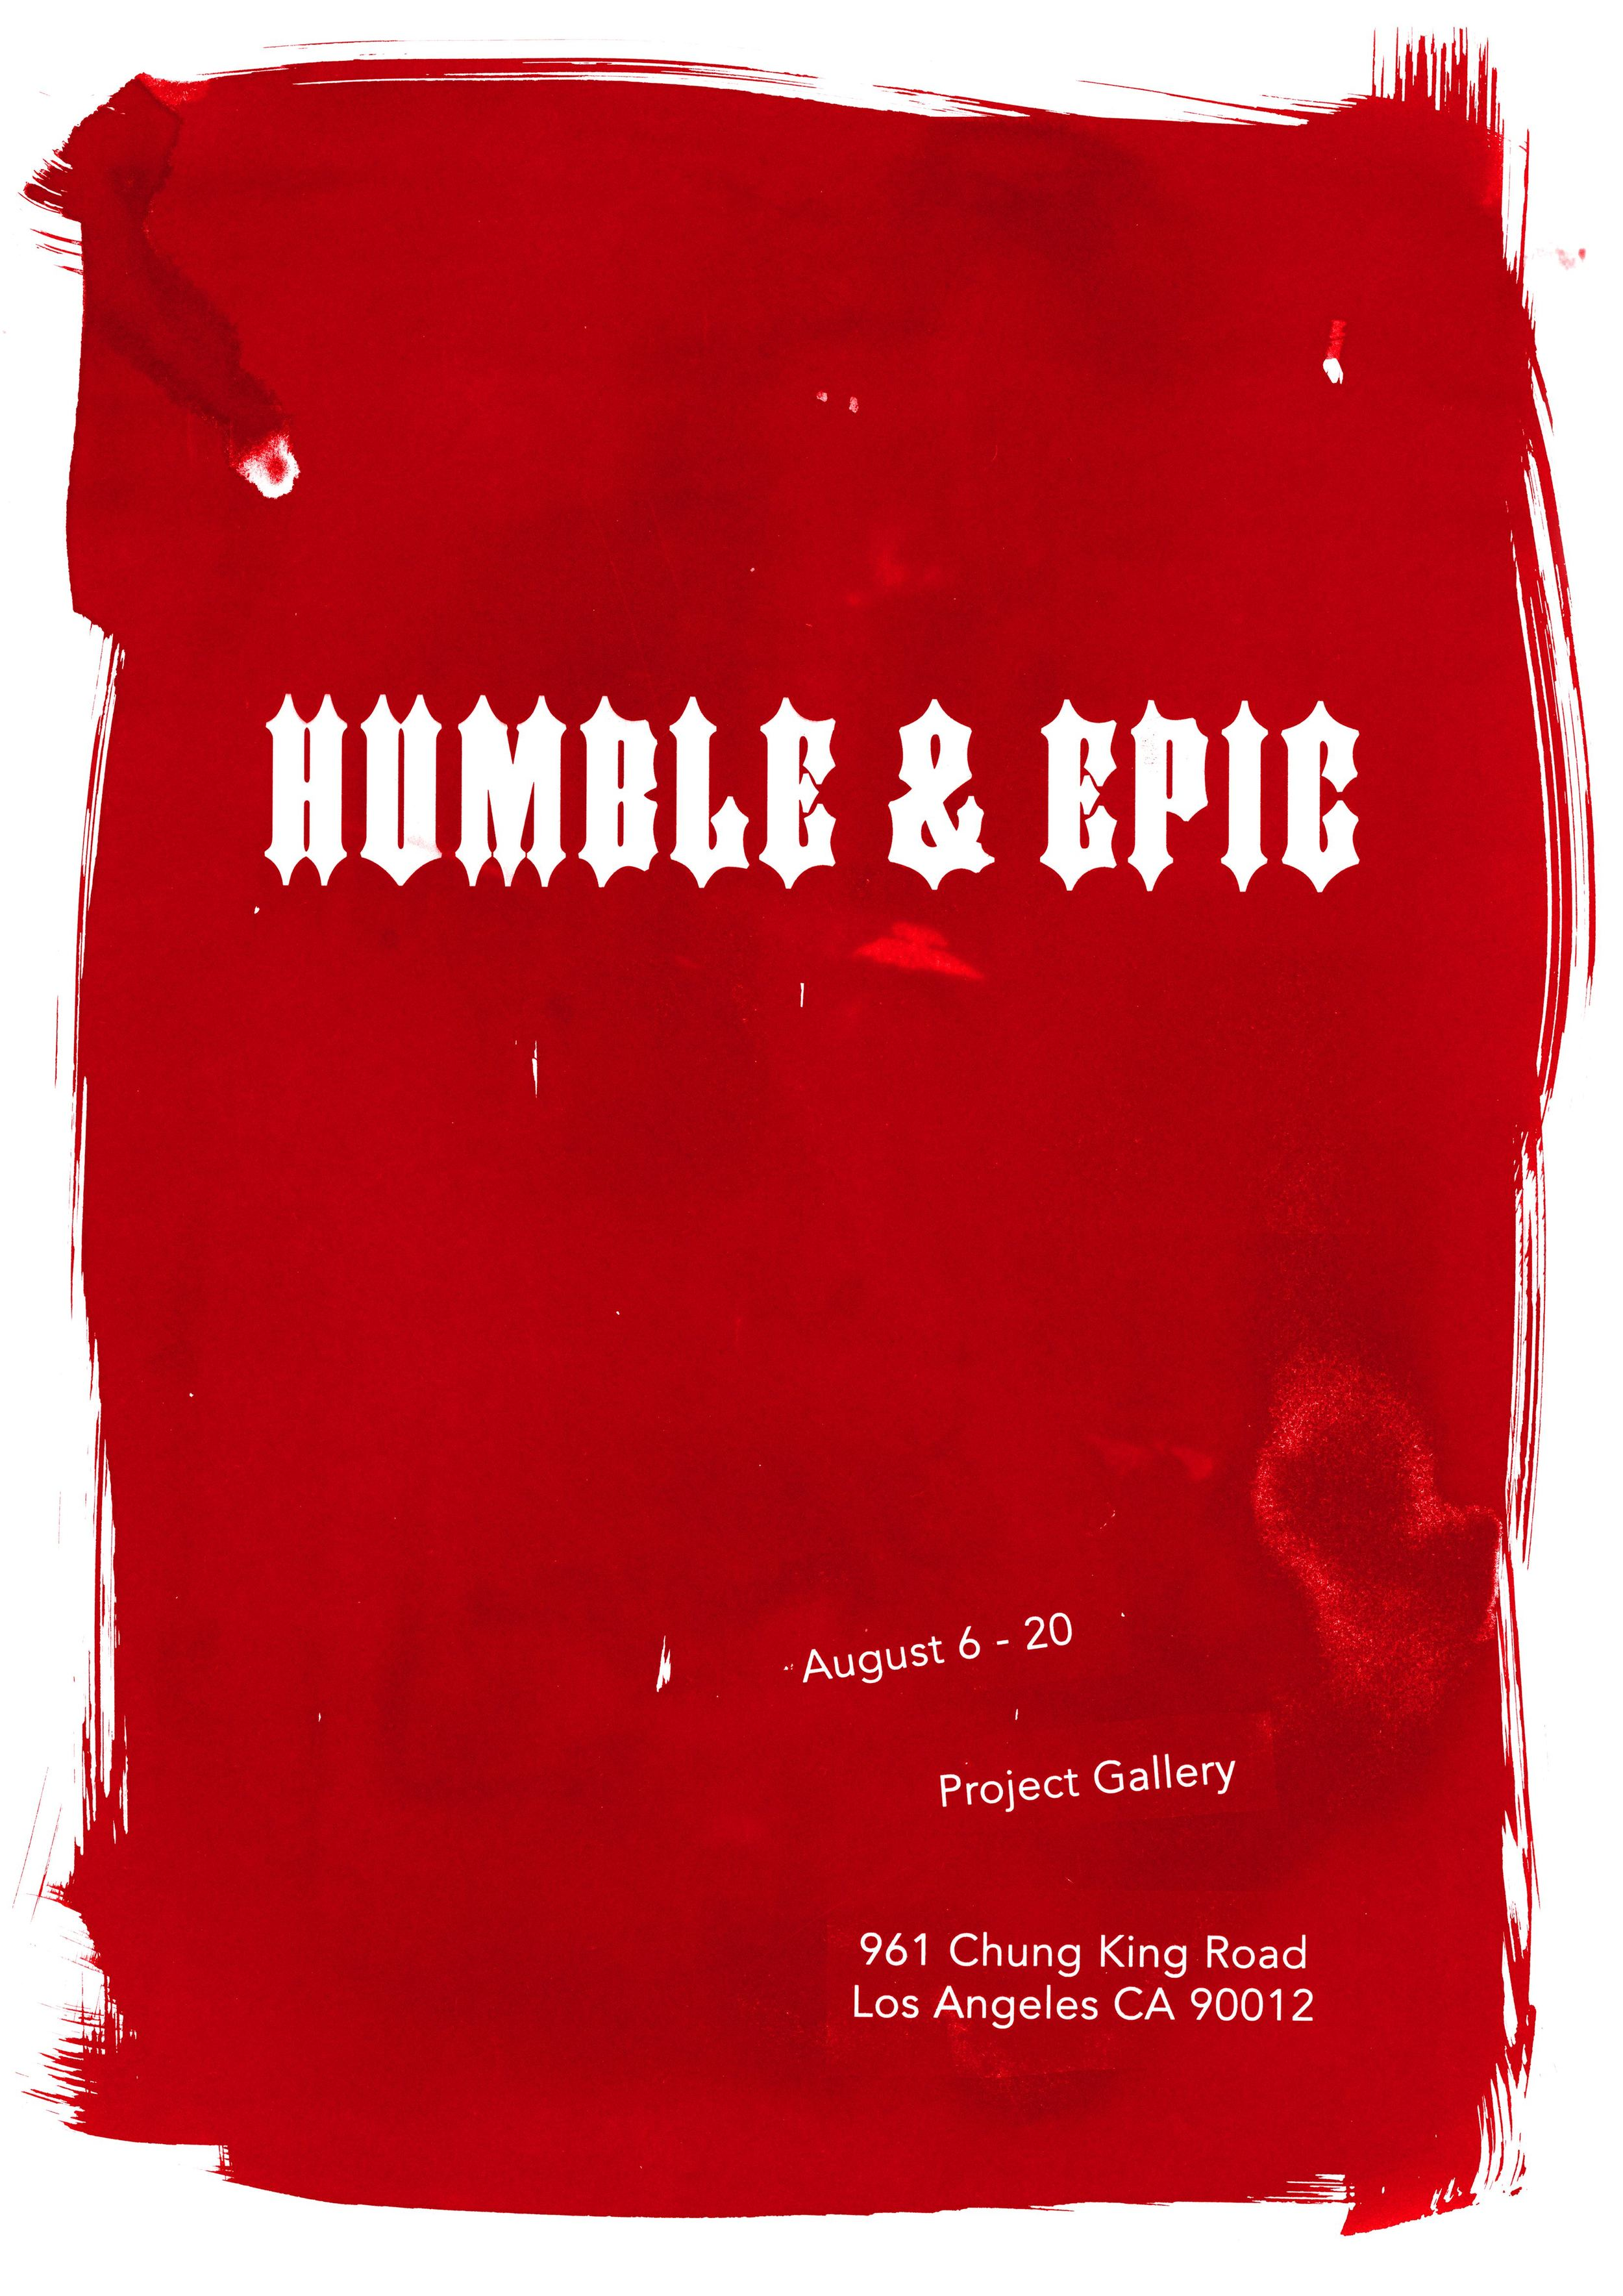 HUMBLE_EPIC_RED_200dpi.jpg